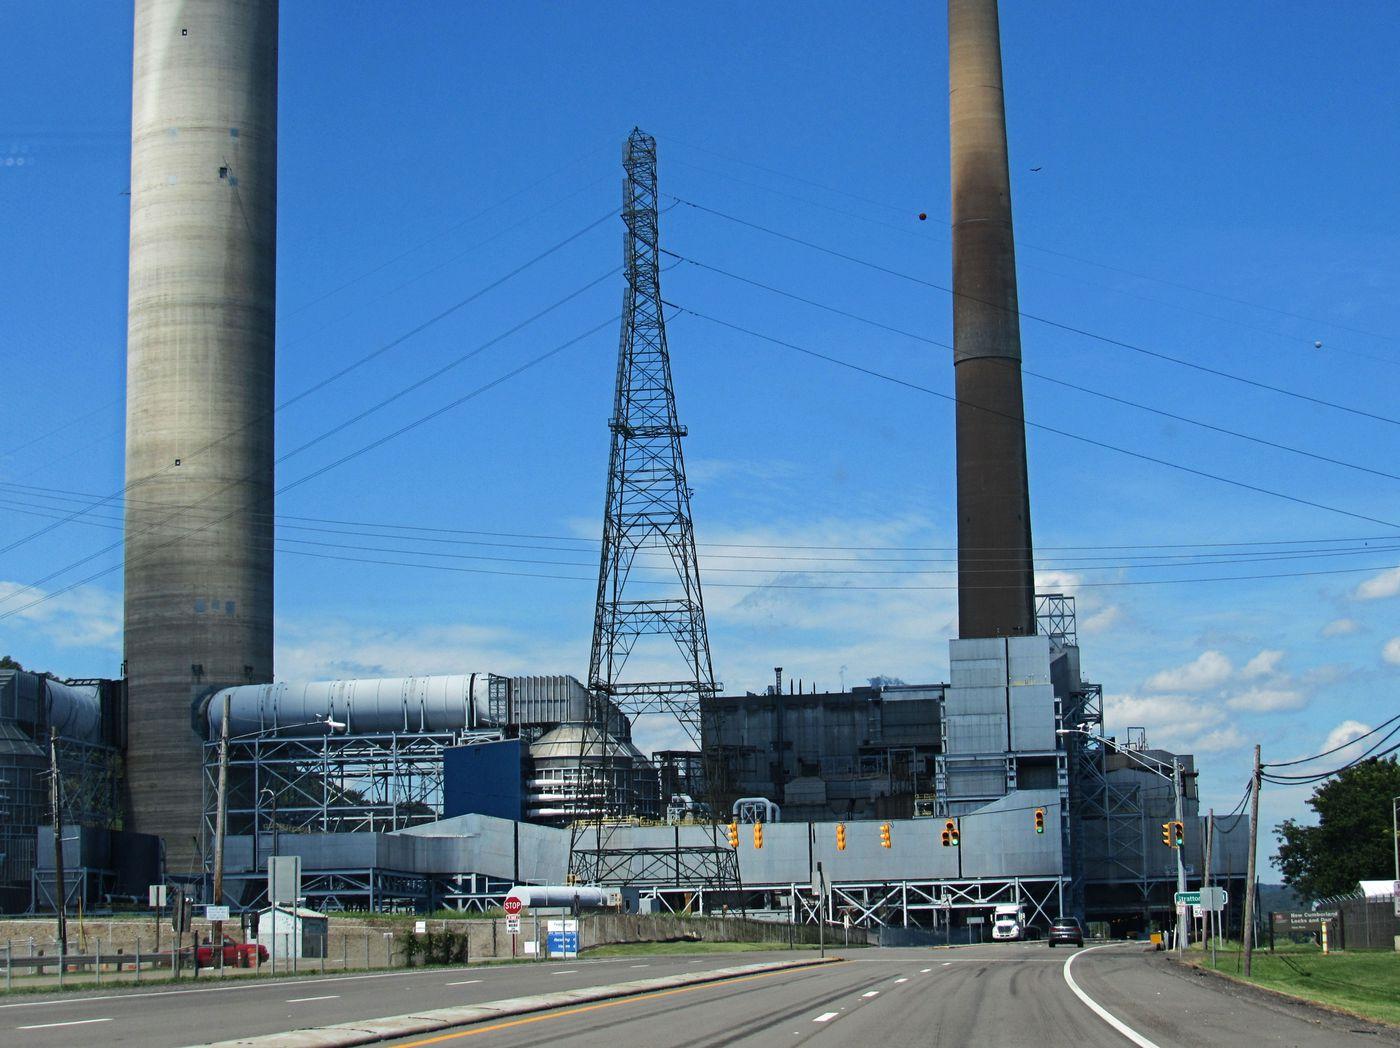 Ohio just passed the worst energy bill of the 21st century - Vox